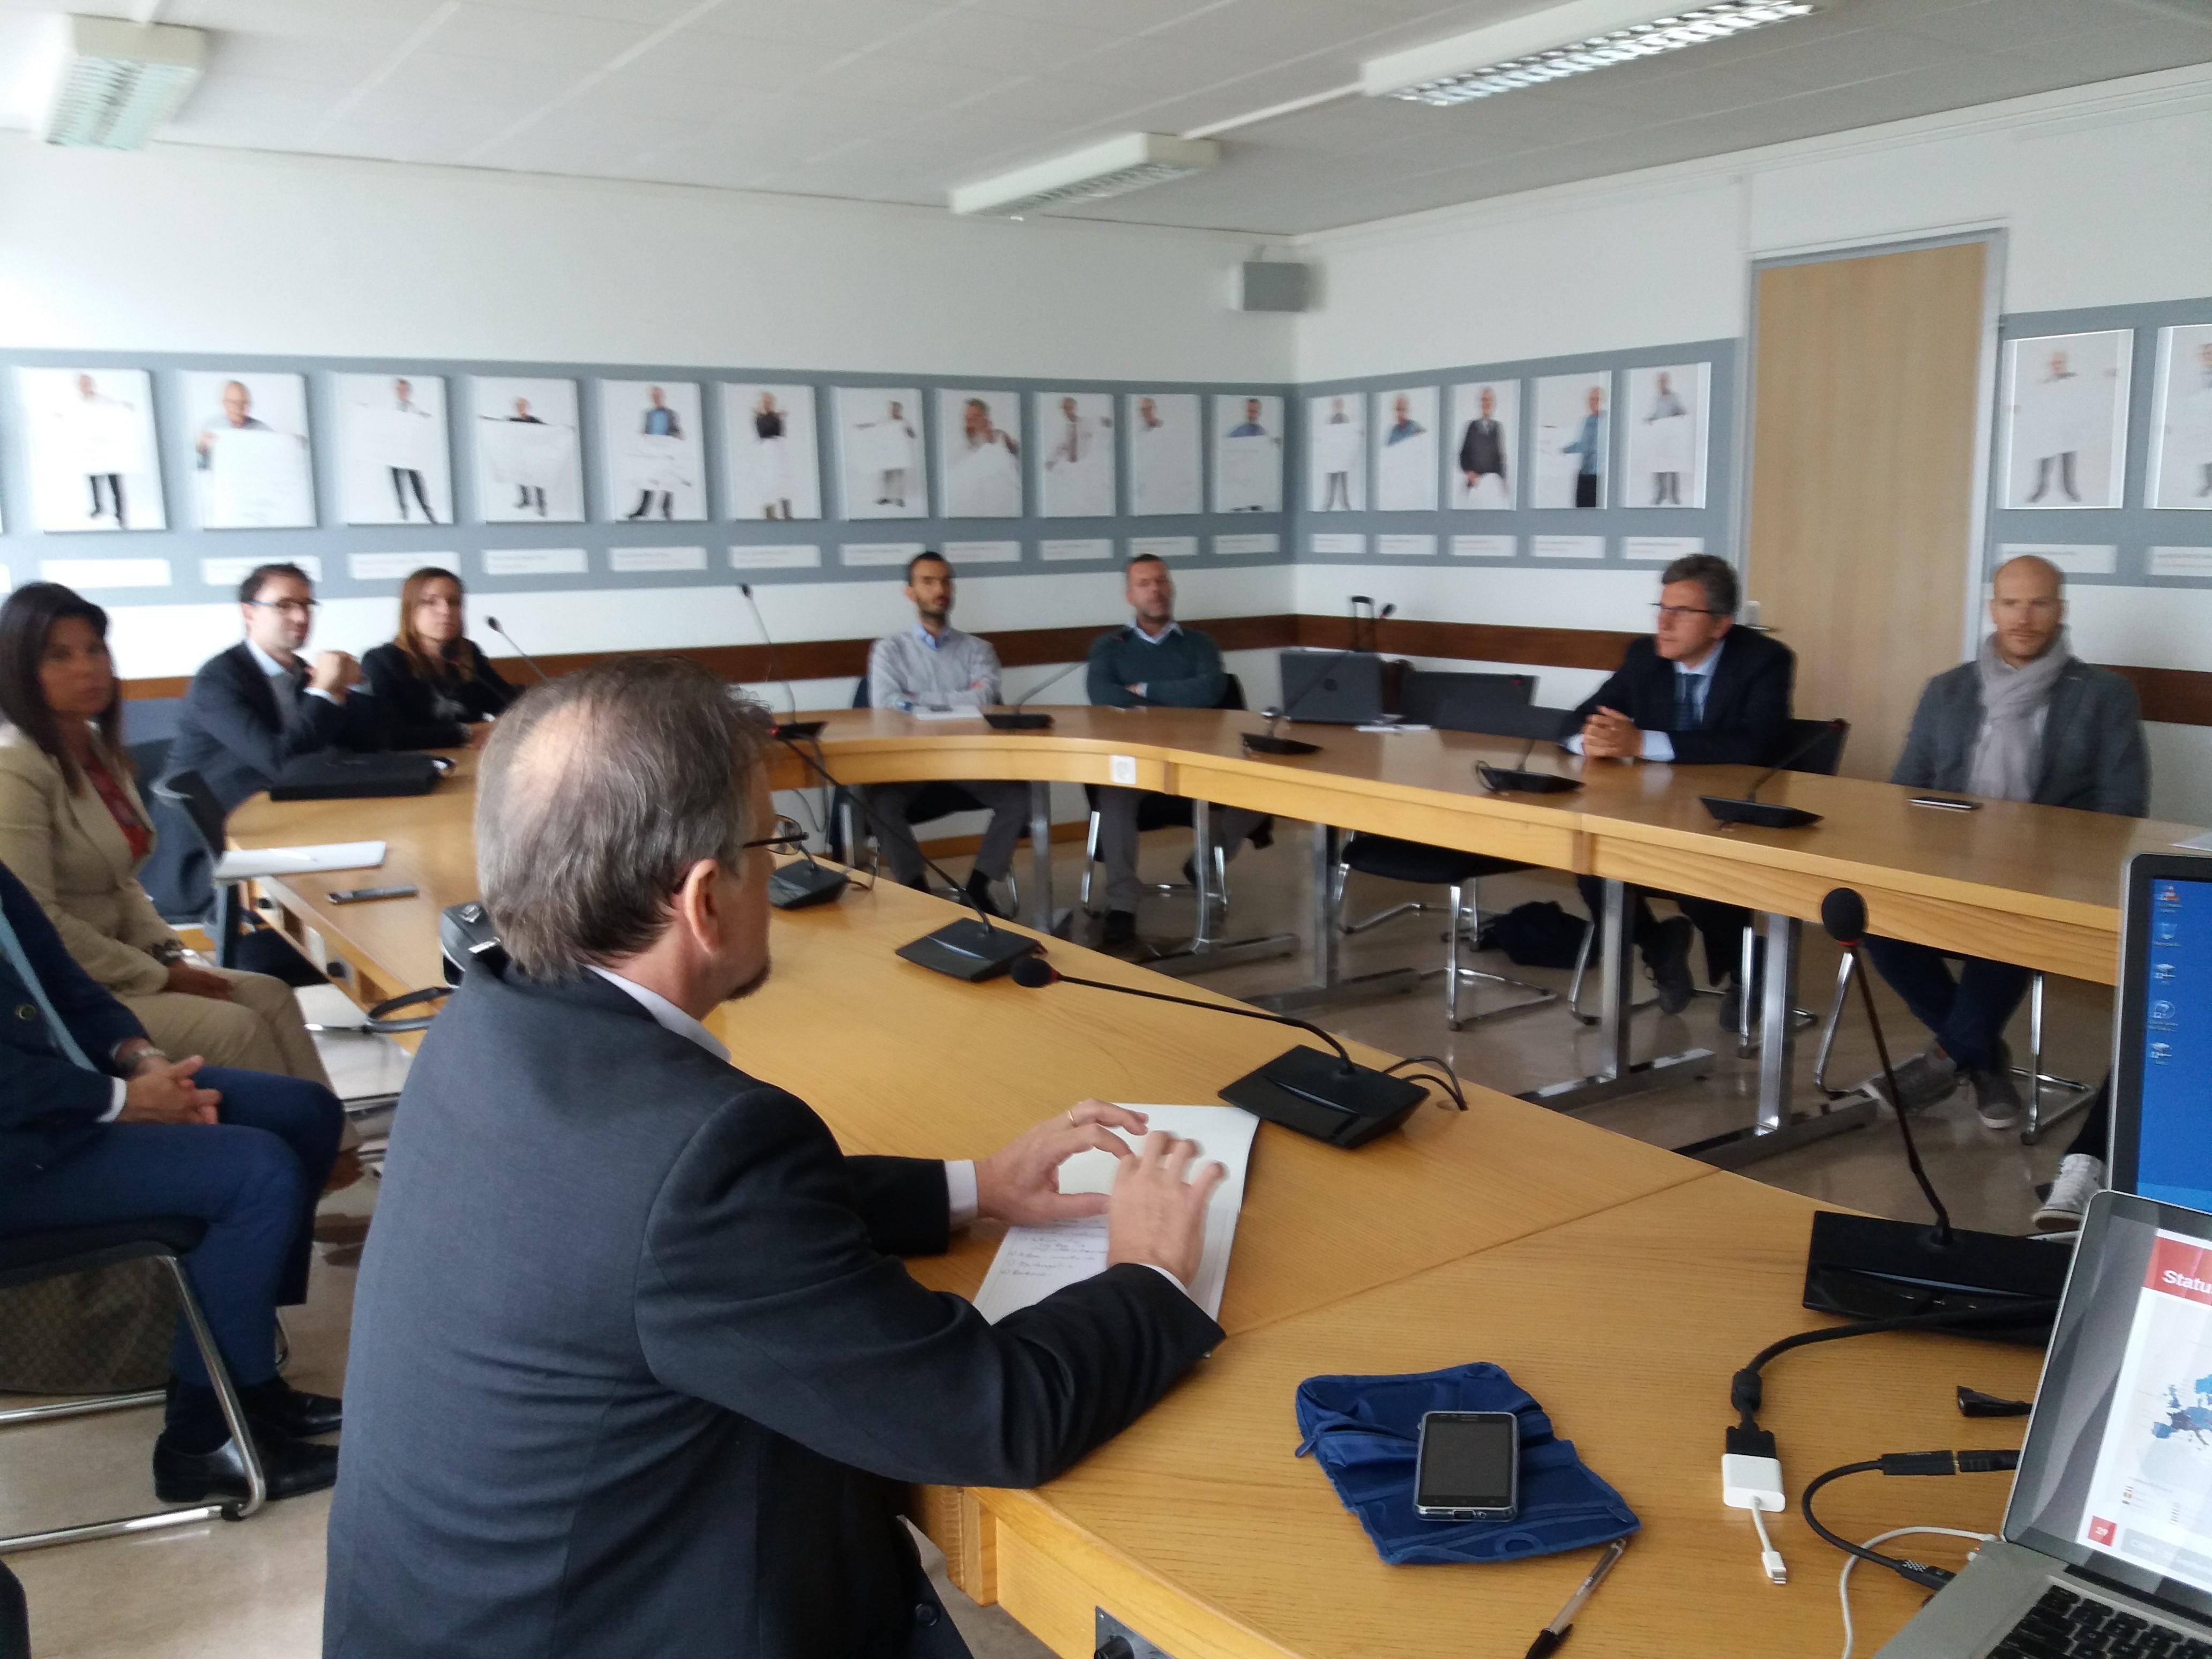 Italian Companies at CERN, September 12-13, 2017